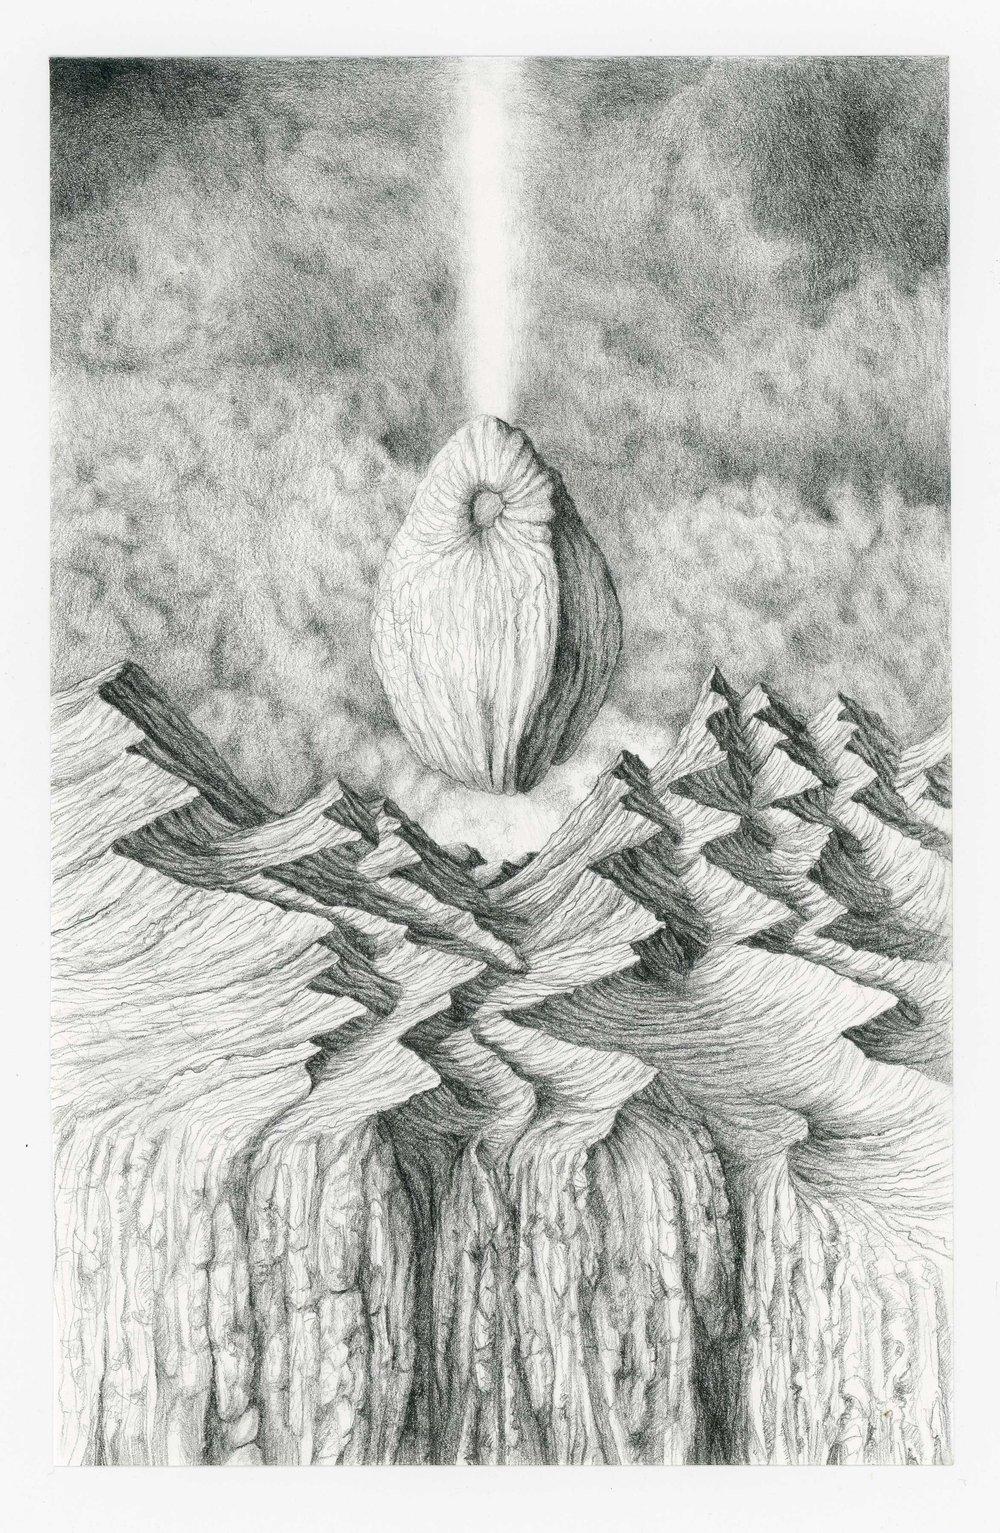 Cat-Butthole-Mtn022_WEB.jpg